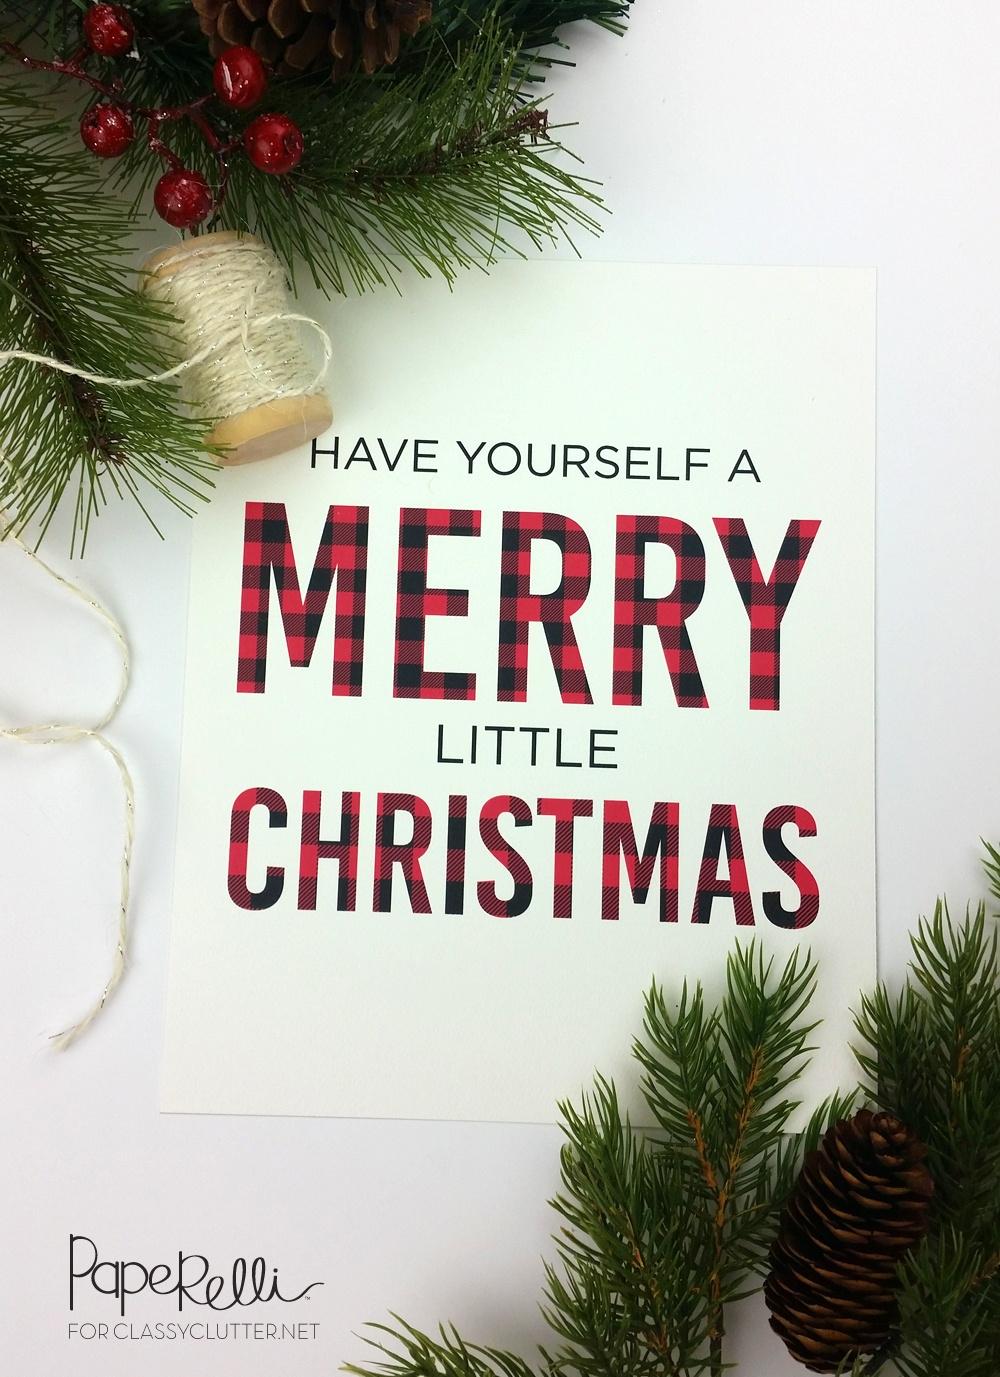 Buffalo Check Plaid Christmas Print - Classy Clutter - Free Printable Christmas Decorations